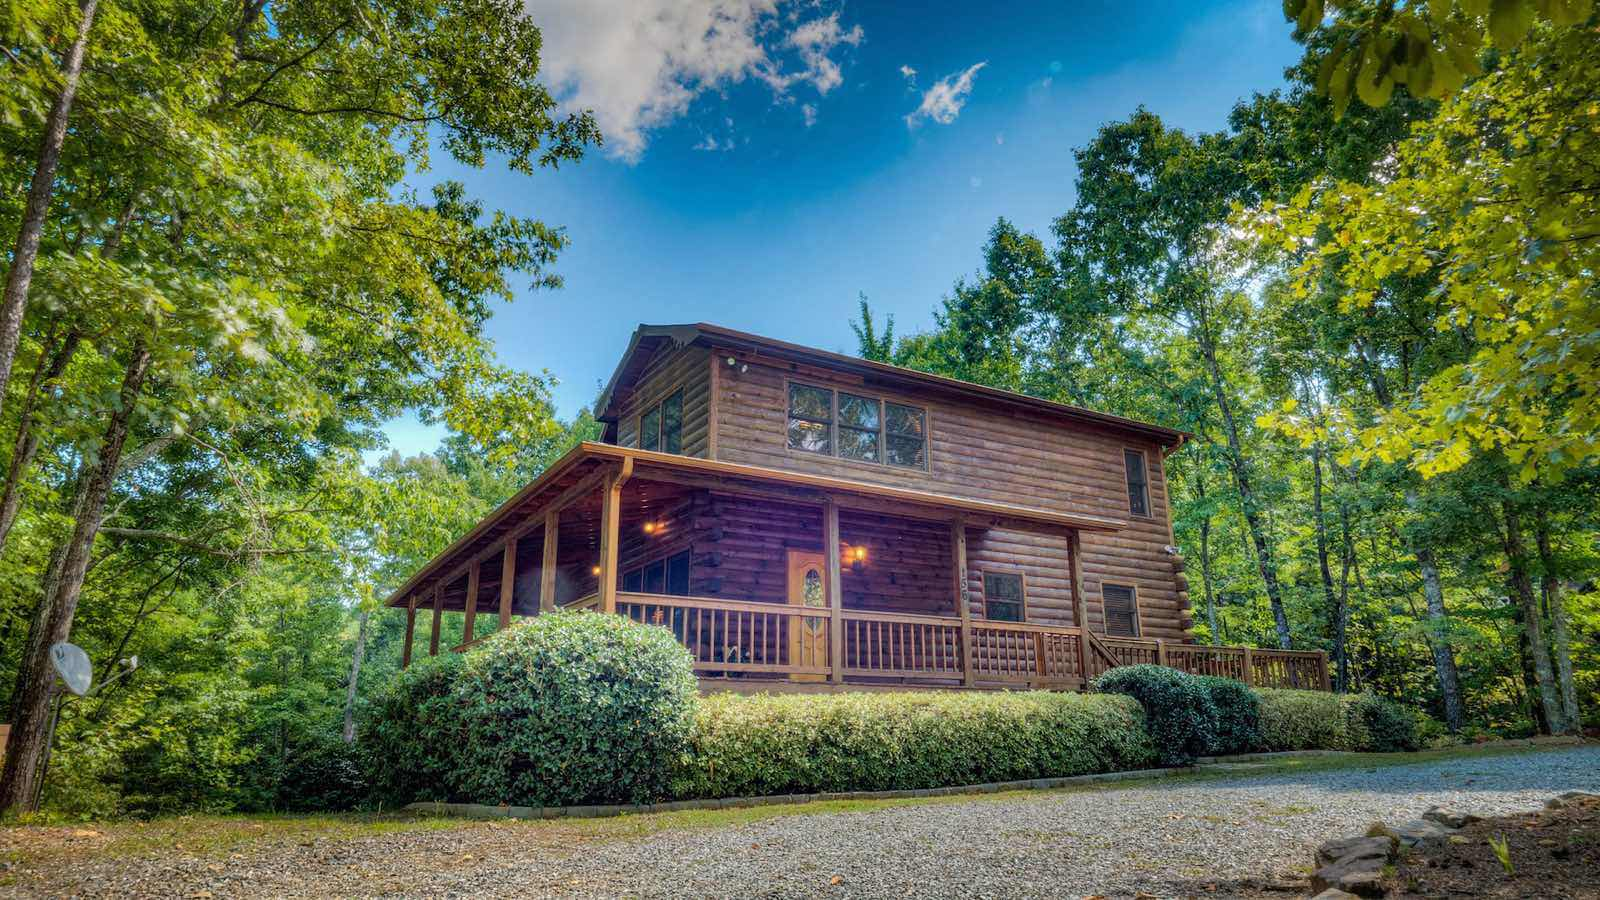 Cabin Rentals In Blue Ridge Ga Downtown Blue Ridge Ga